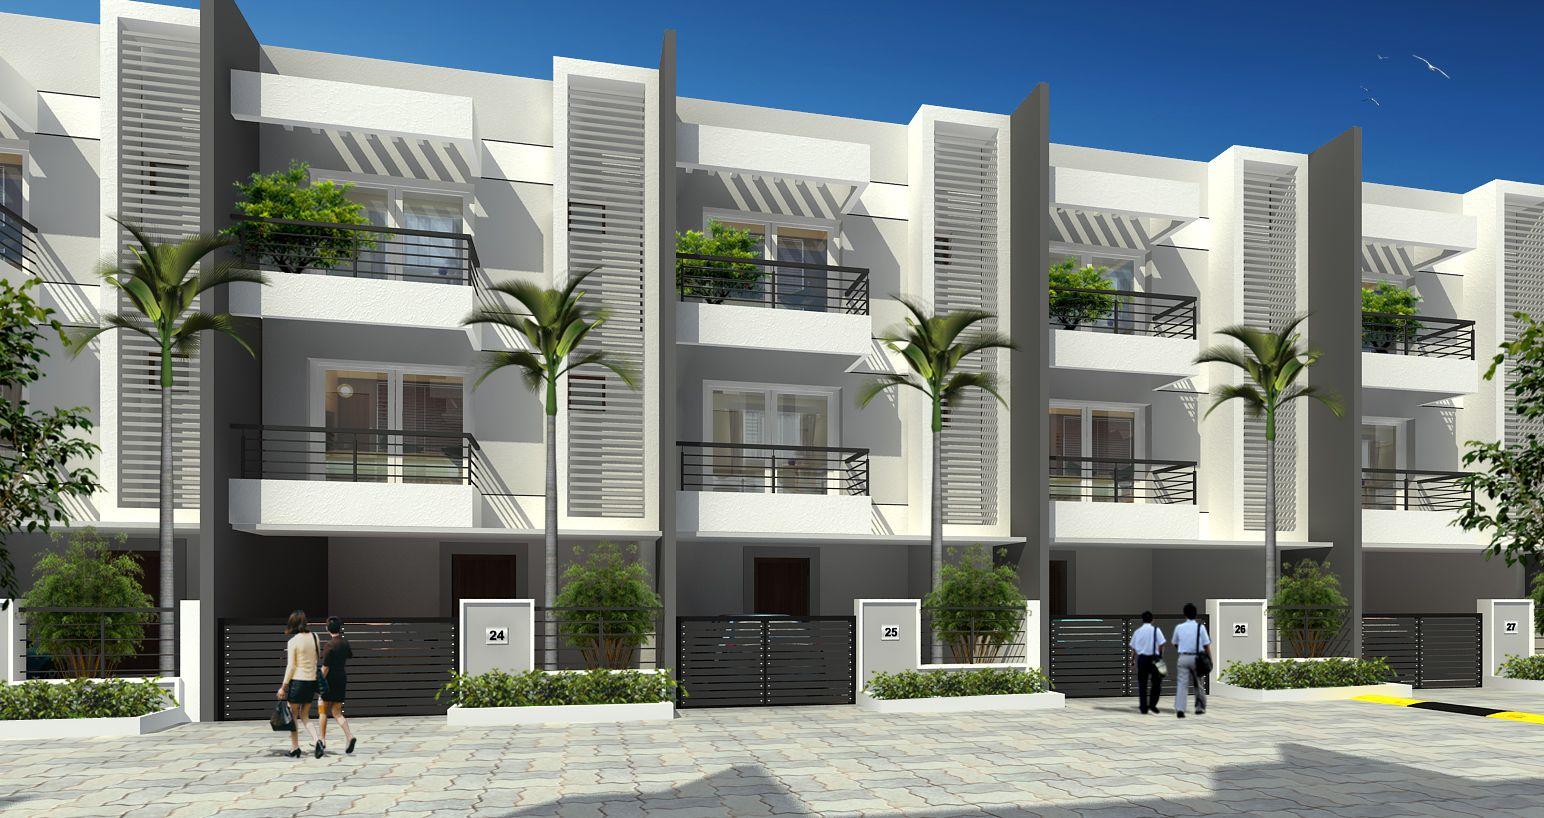 Modern Row House Elevation Google Search Row House Design Townhouse Designs Duplex House Design